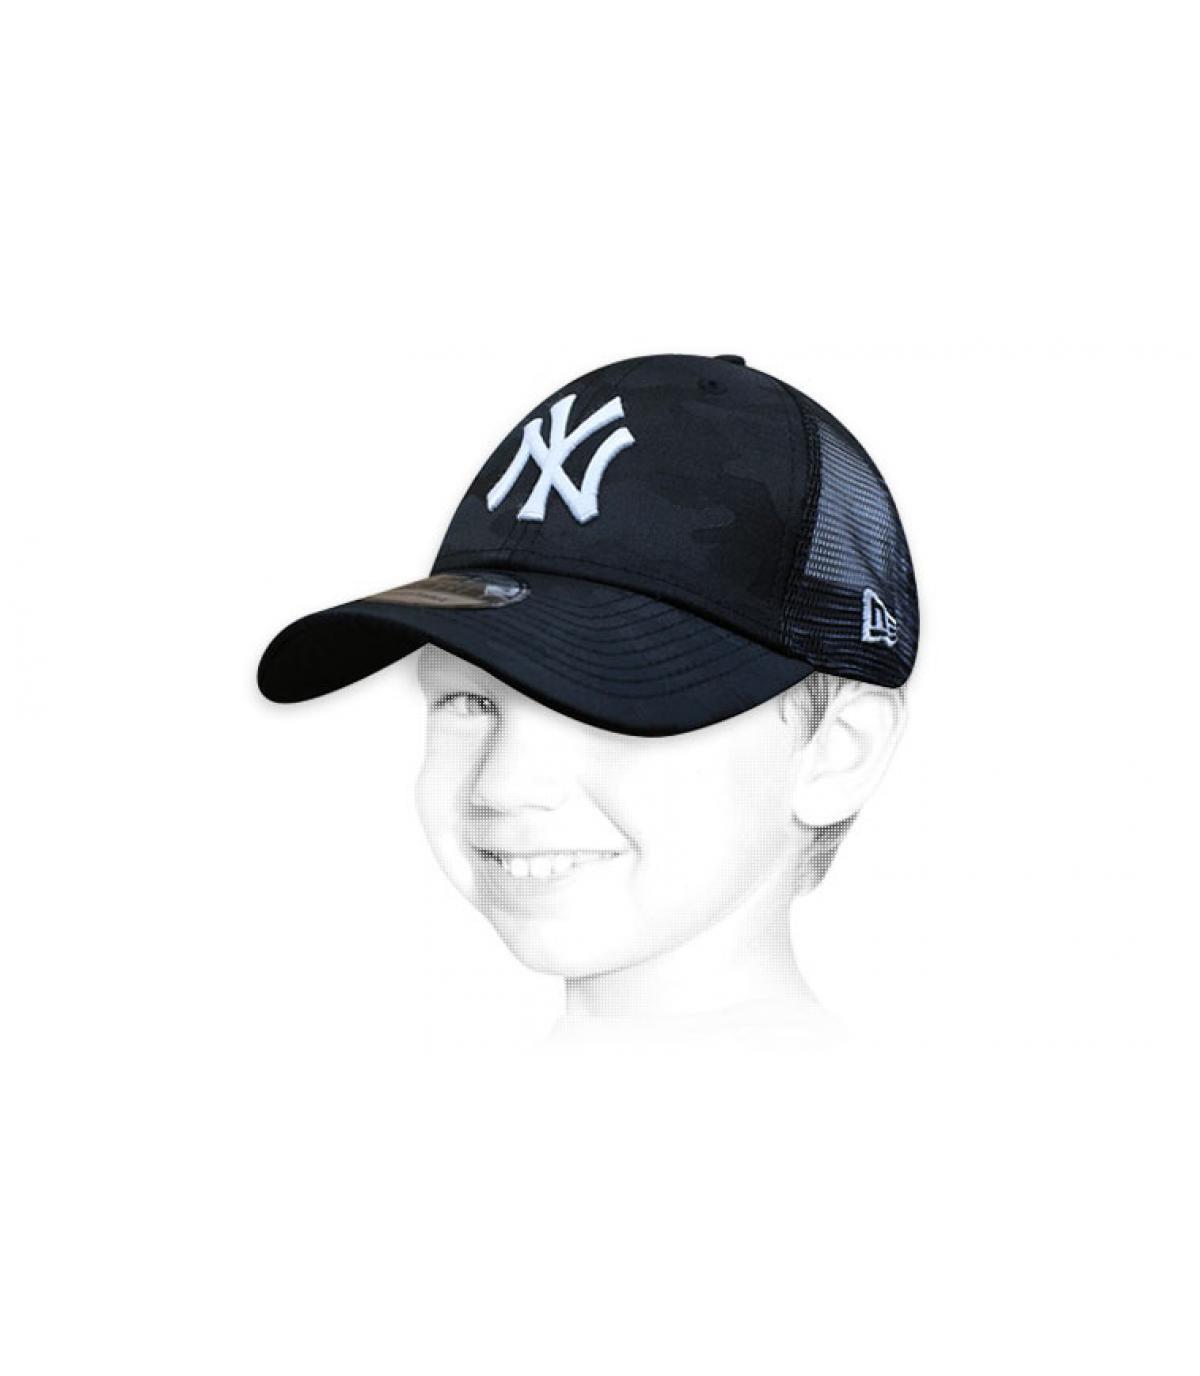 trucker enfant NY noir